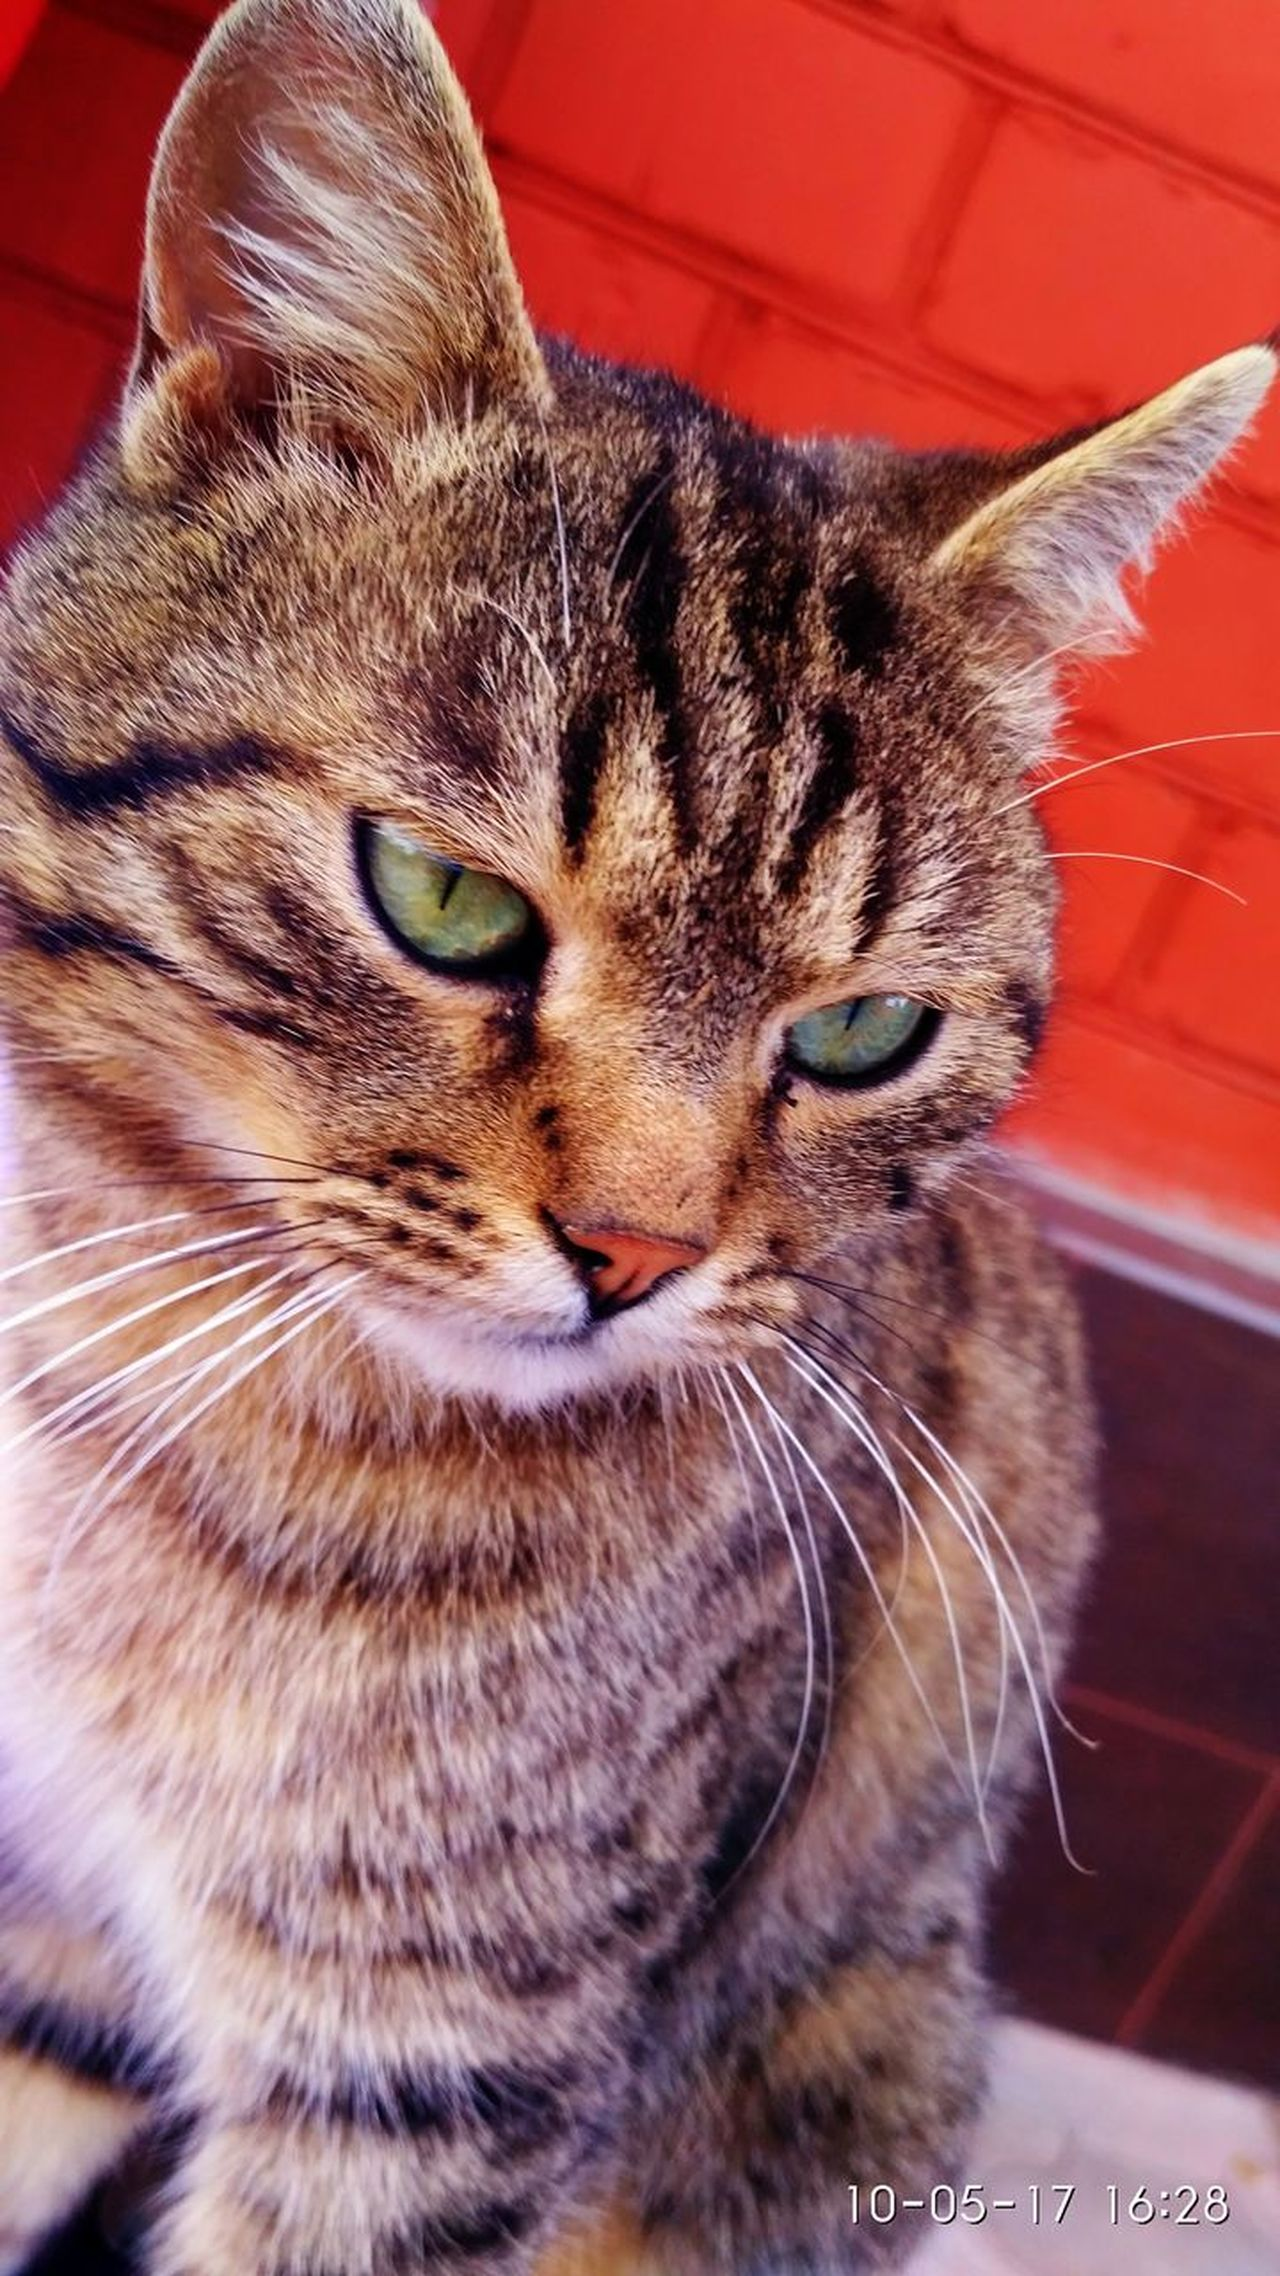 One Animal Animal Themes Cat